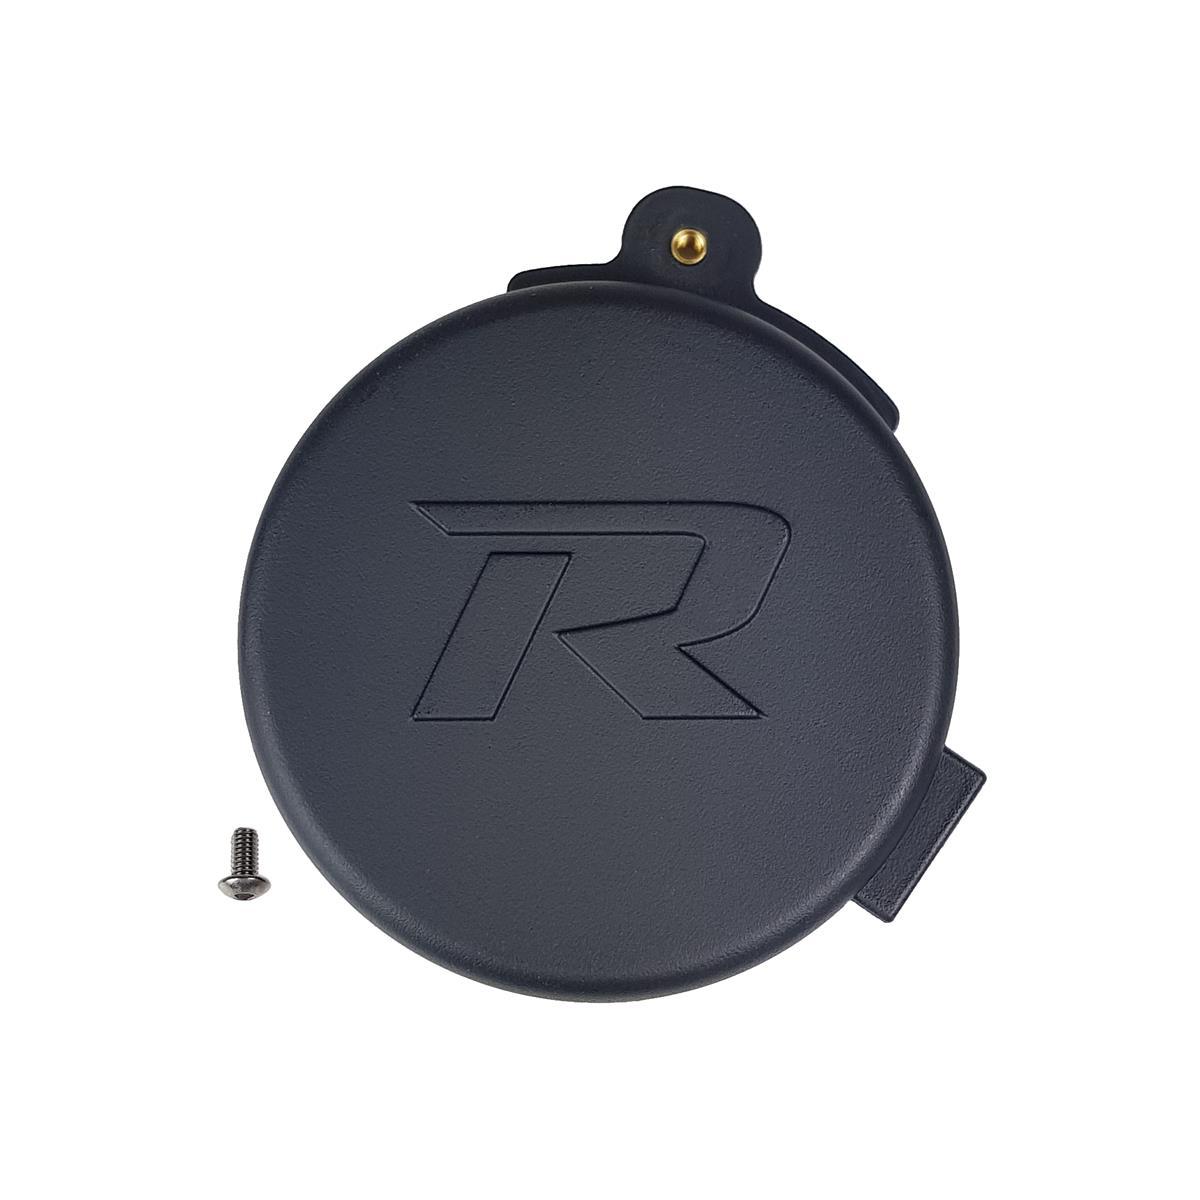 Shell for Yamaha PW-X2 engine for TrailRay, HardRay, FullRay and CrossRay models